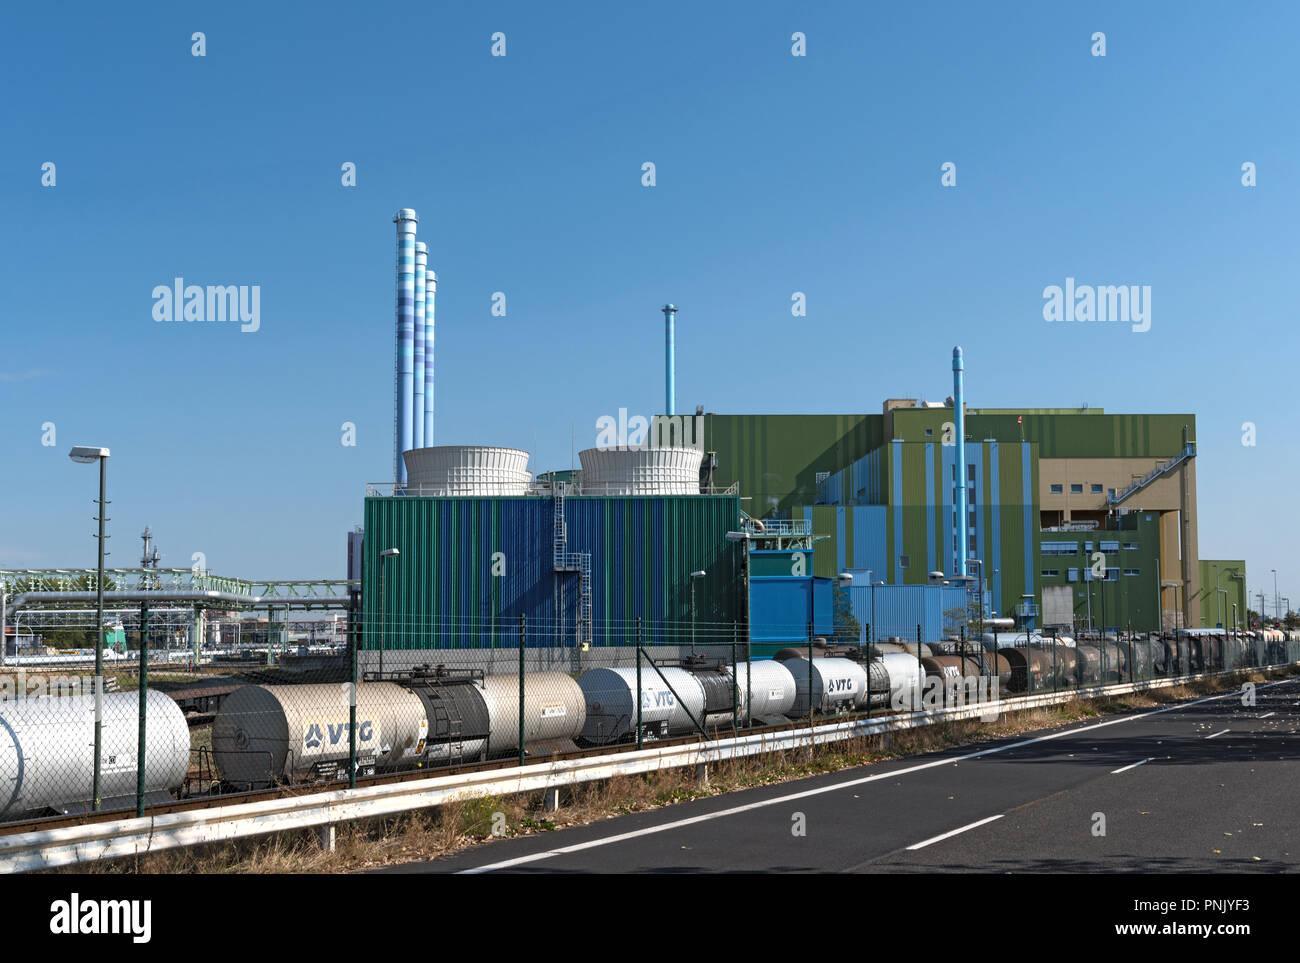 Industrial waste incinerator in an industrial park Frankfurt-Hoechst. - Stock Image